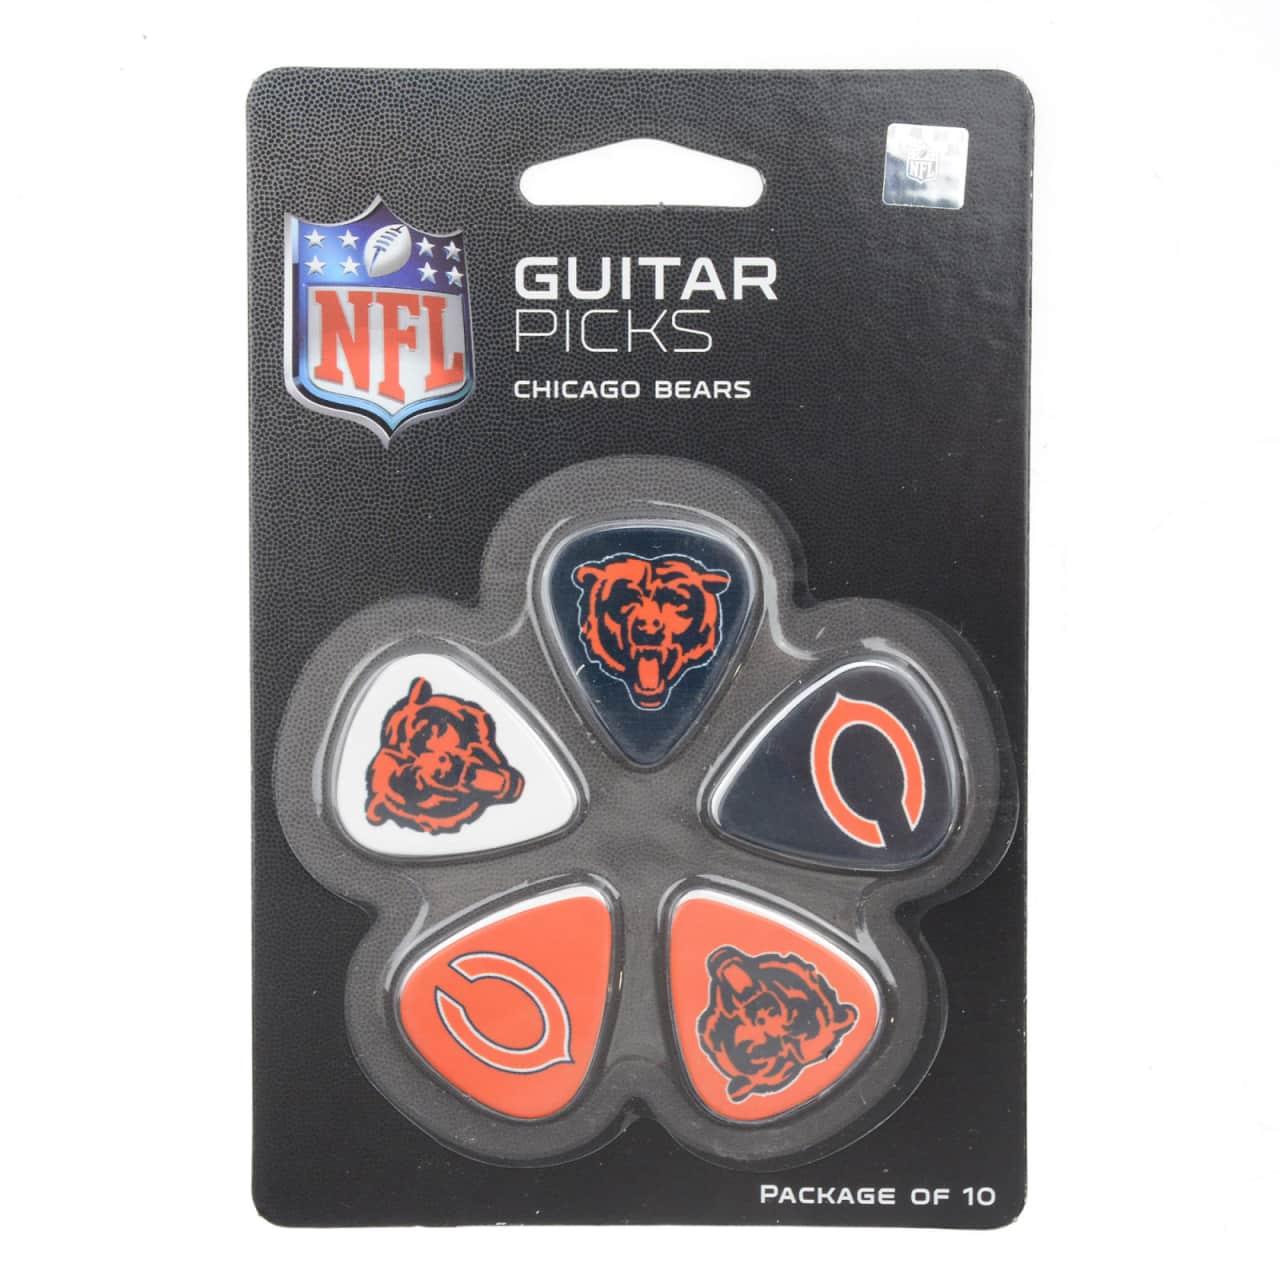 Auto Exchange Nj >> Woodrow Chicago Bears Guitar Picks 5 Pack | Reverb